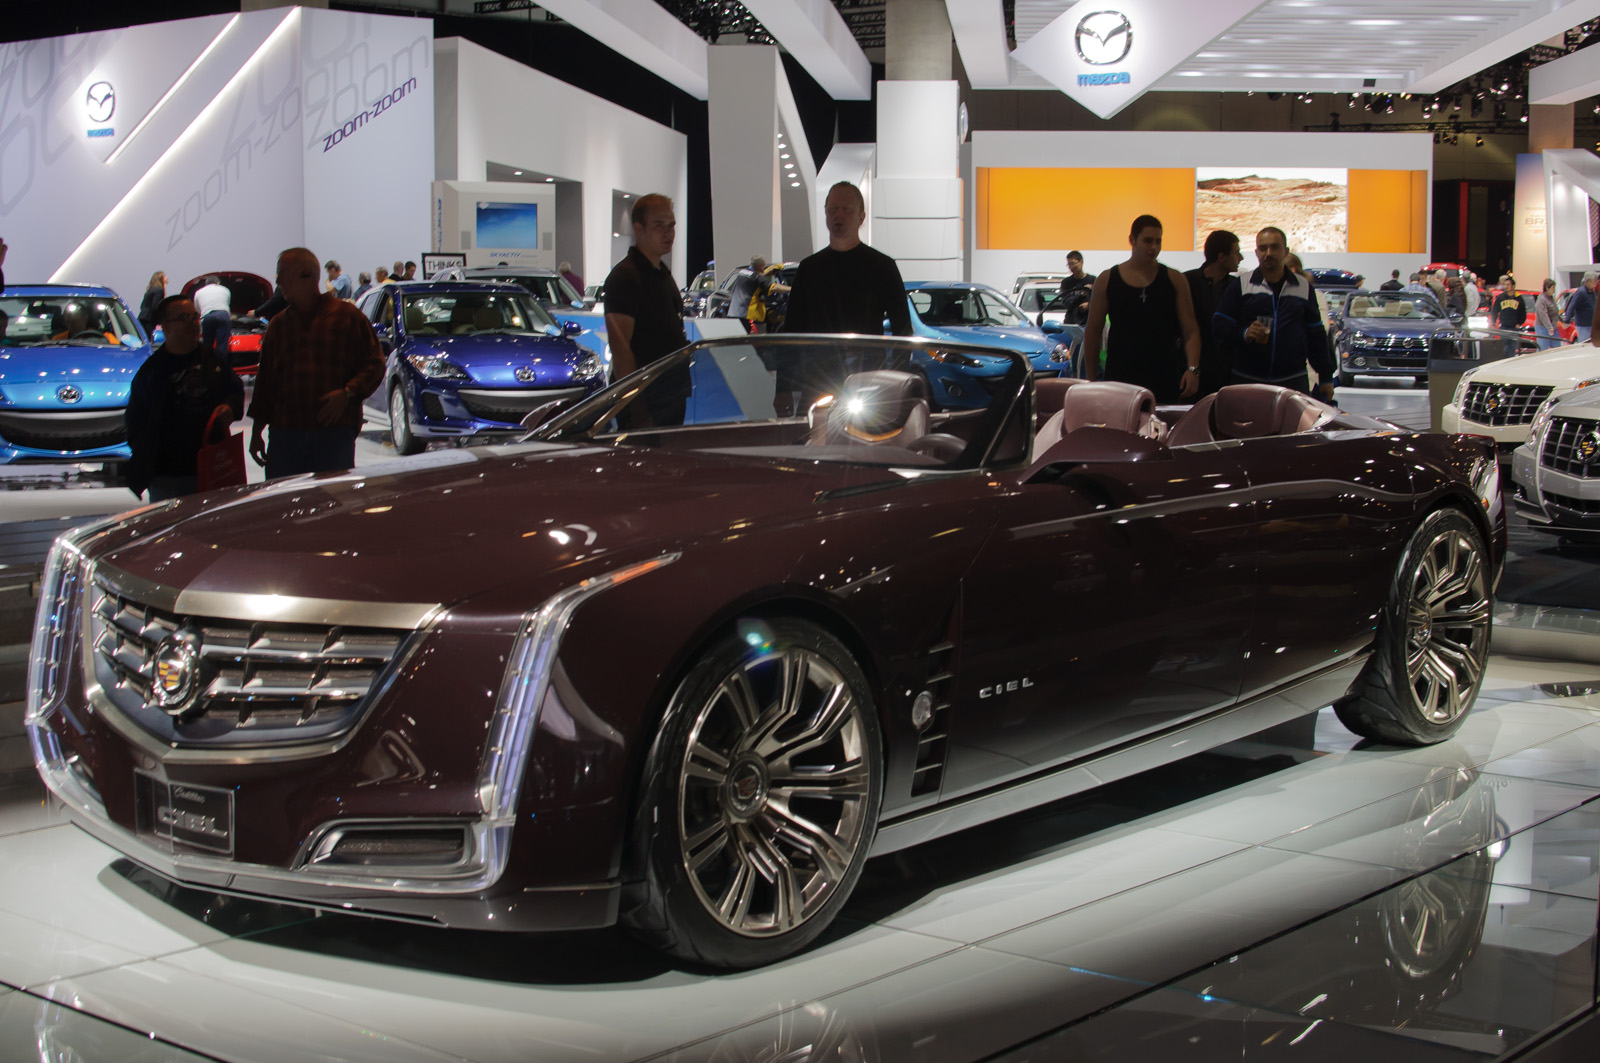 2017 Cadillac Ciel Luxury, Concept, Price, Release date